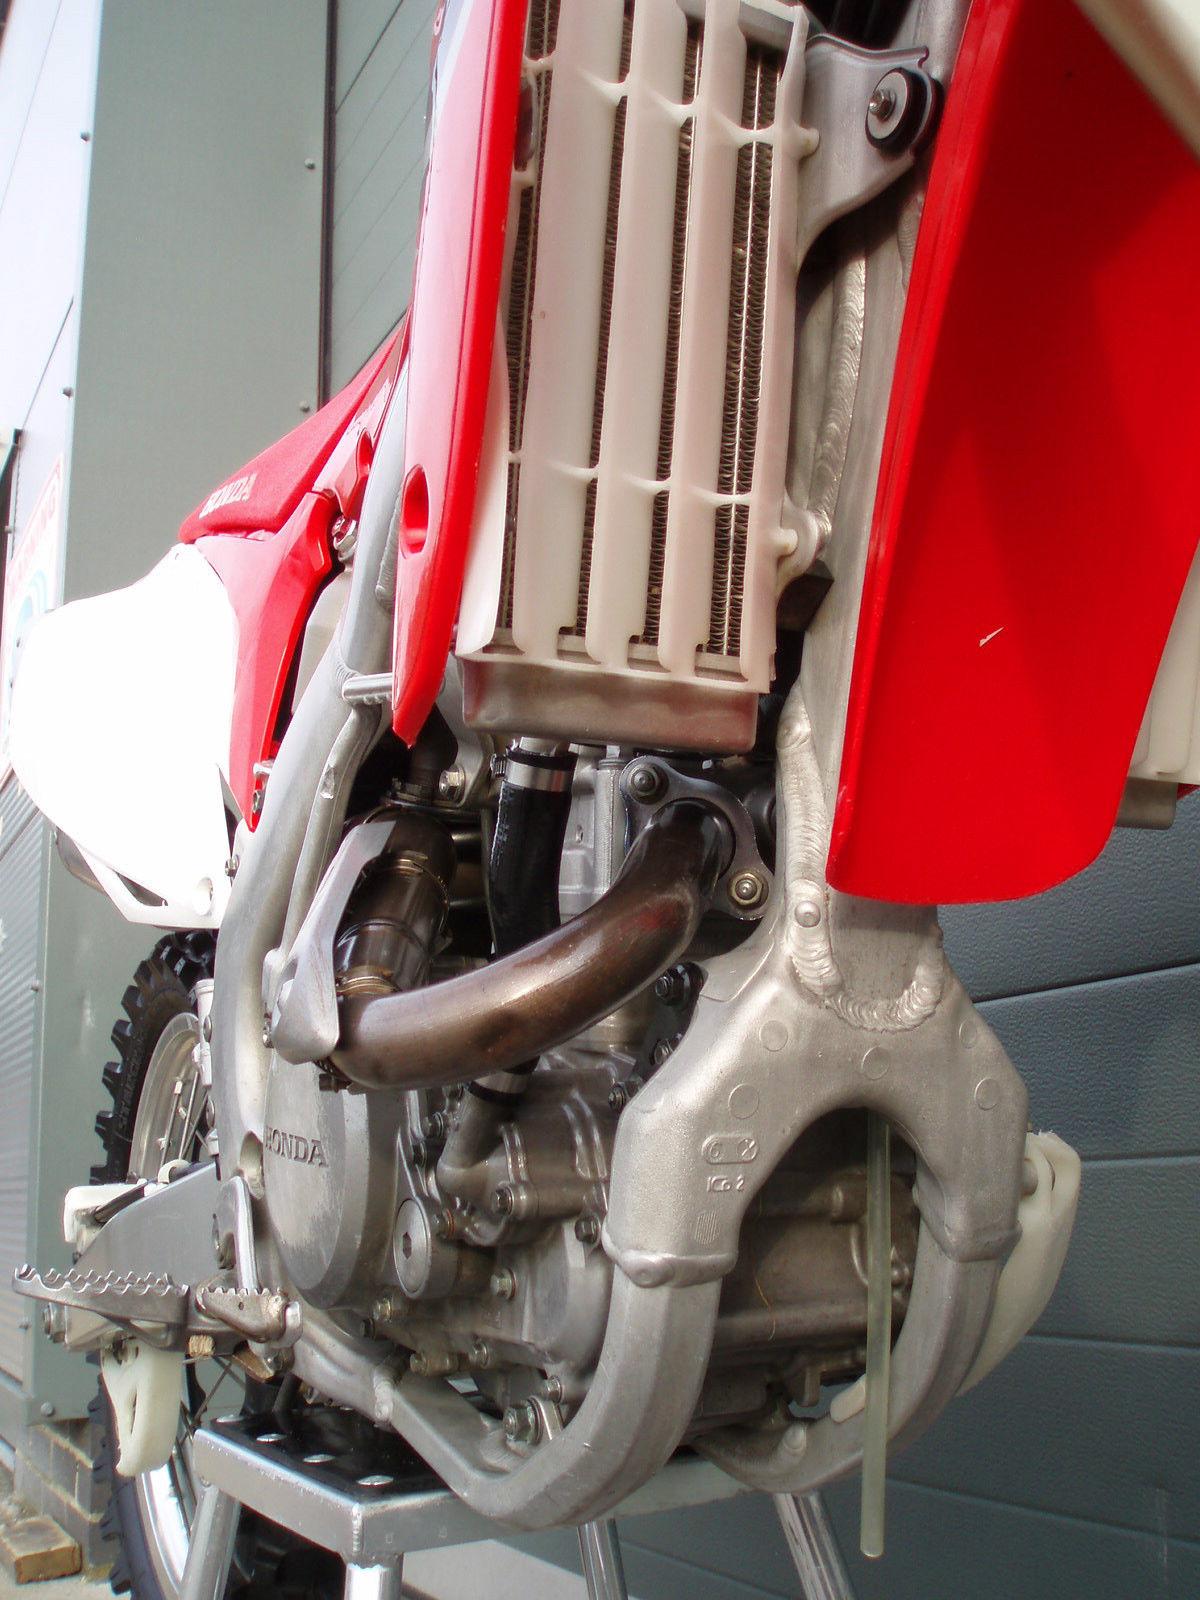 Kawasaki Ninja 250r F Model Wiring Diagram Binatanicom